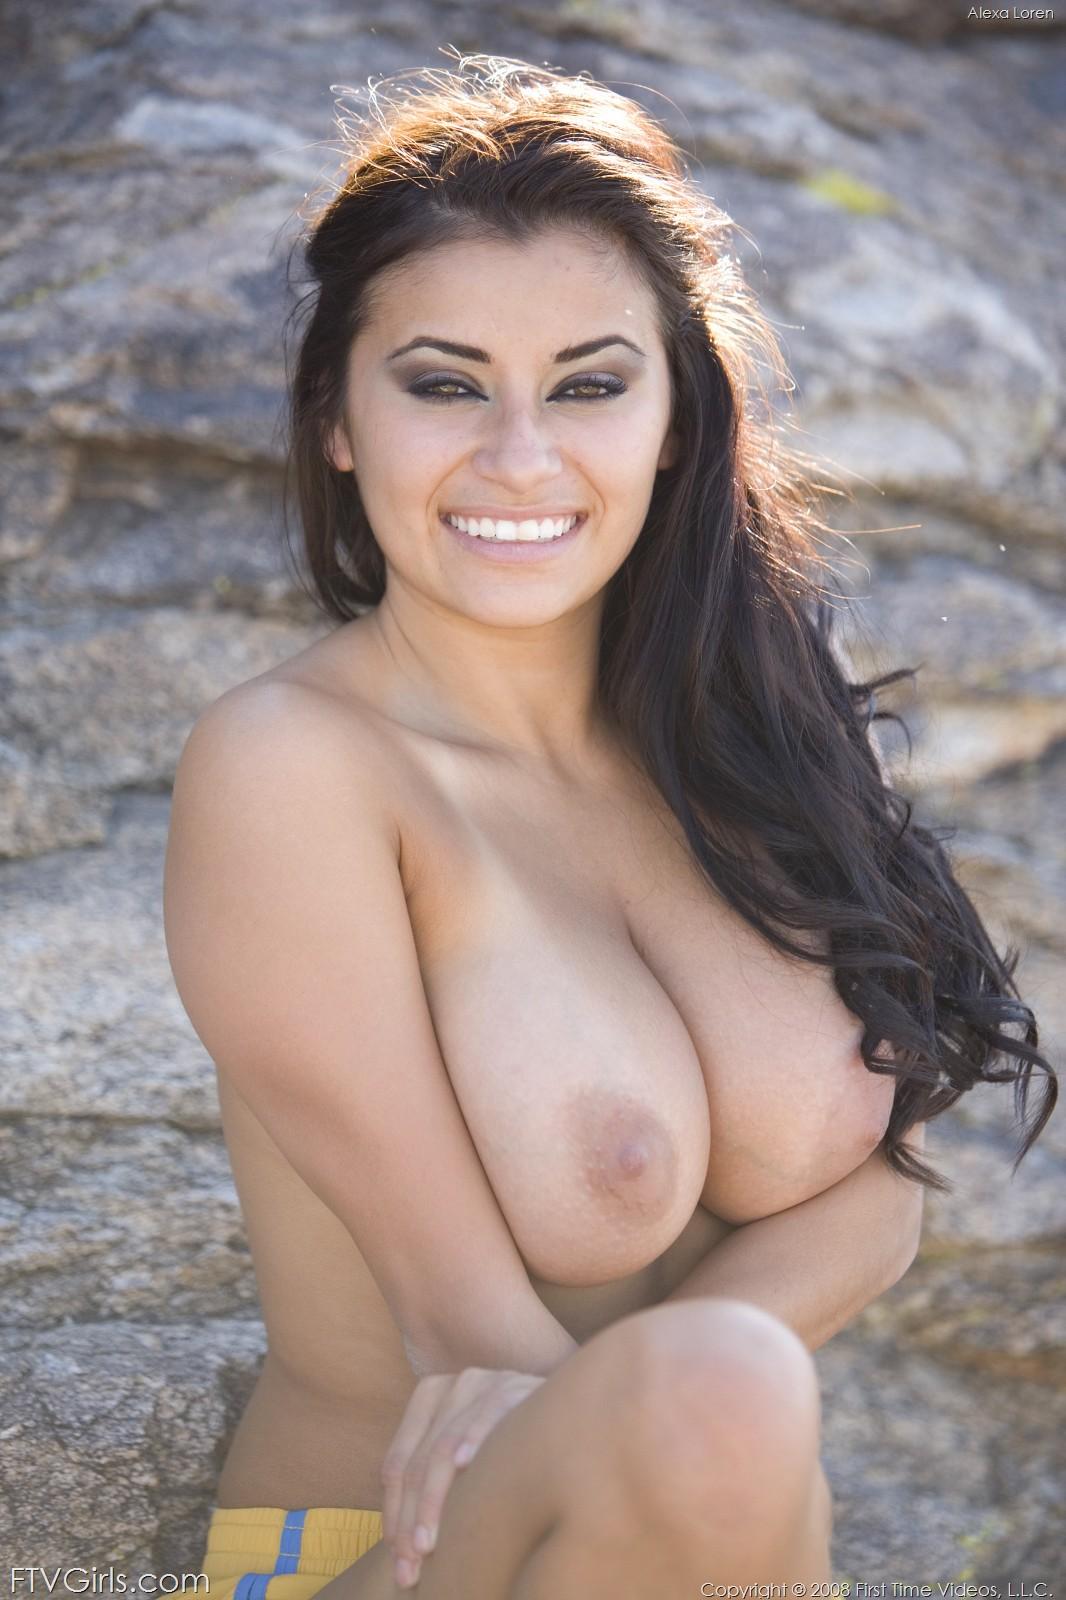 alexa loren naked